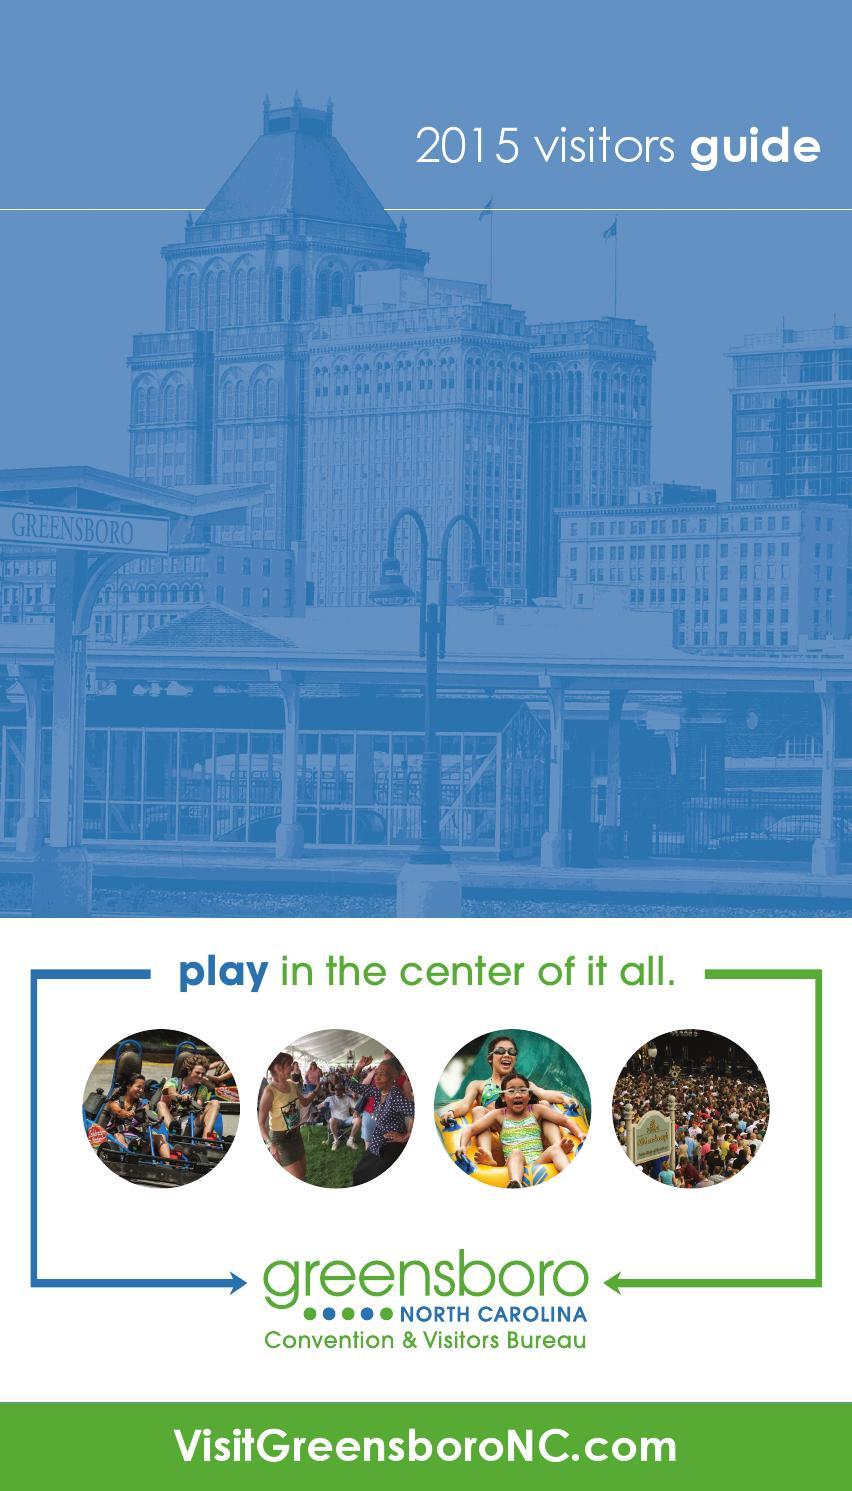 2015 Greensboro Visitors Guide by Greensboro CVB - issuu